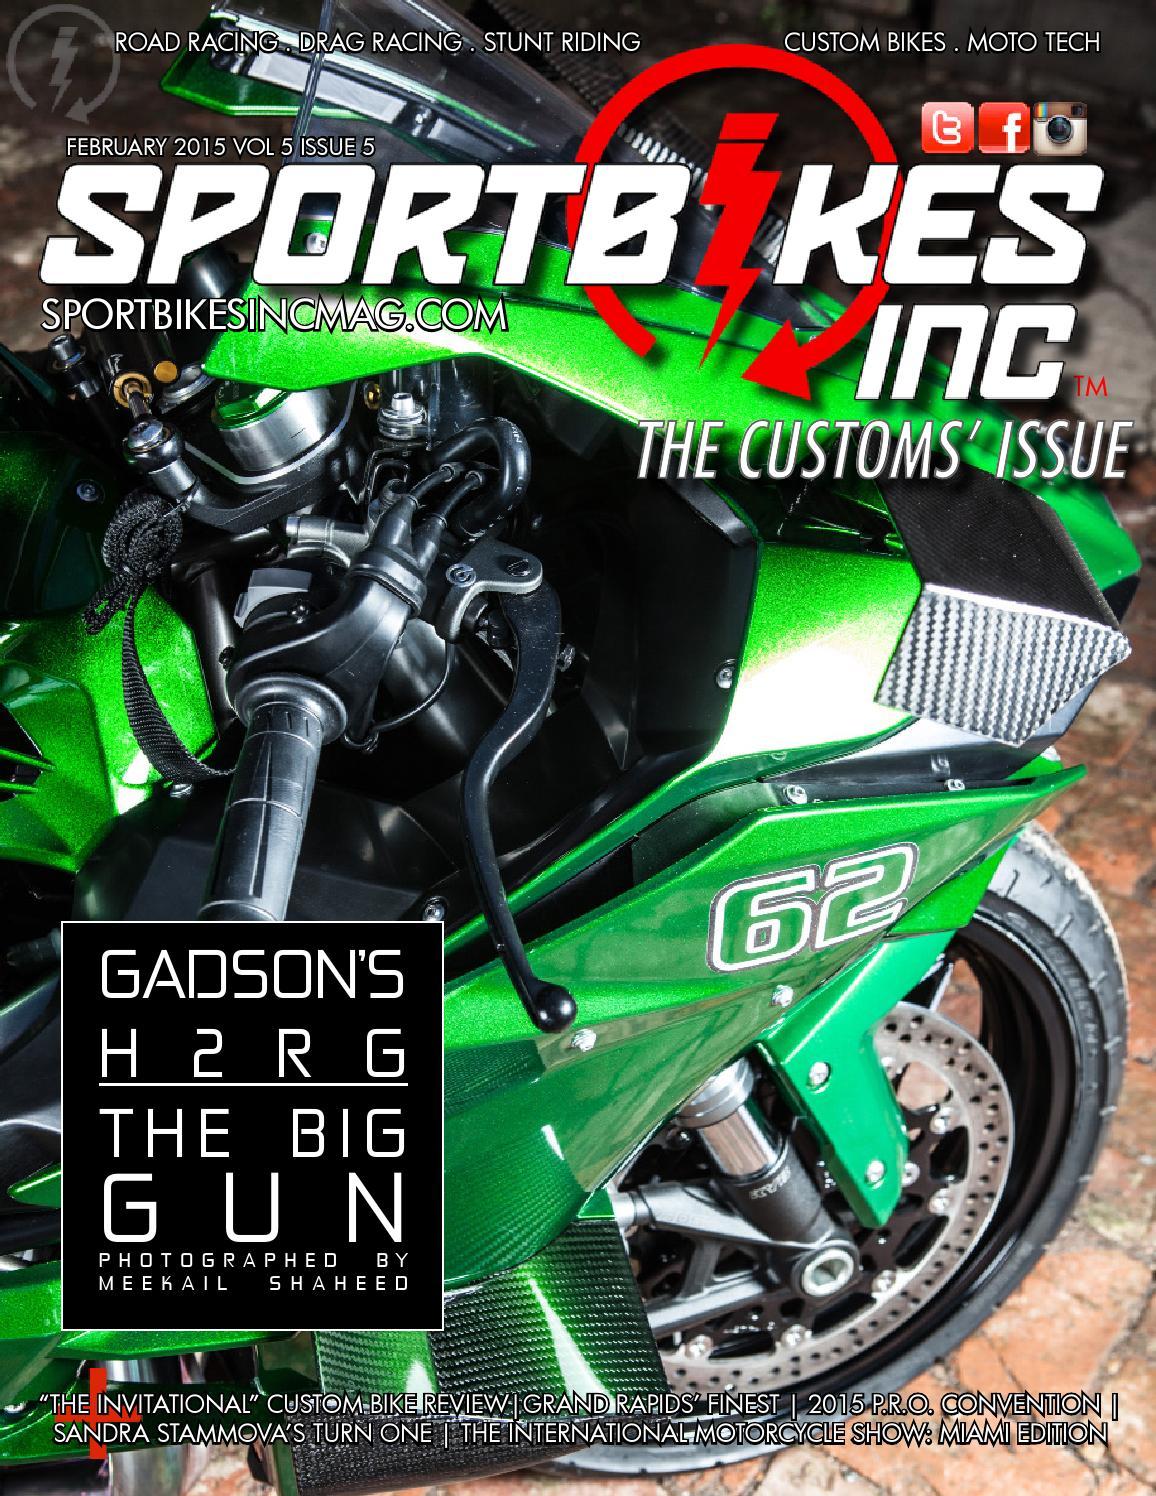 Sportbikes Inc Magazine February 2015 By Hard Knocks Motorcycle Chopper Wiring Diagram 2006 Yamaha R6 Electric Fish Shocker Entertainment Issuu